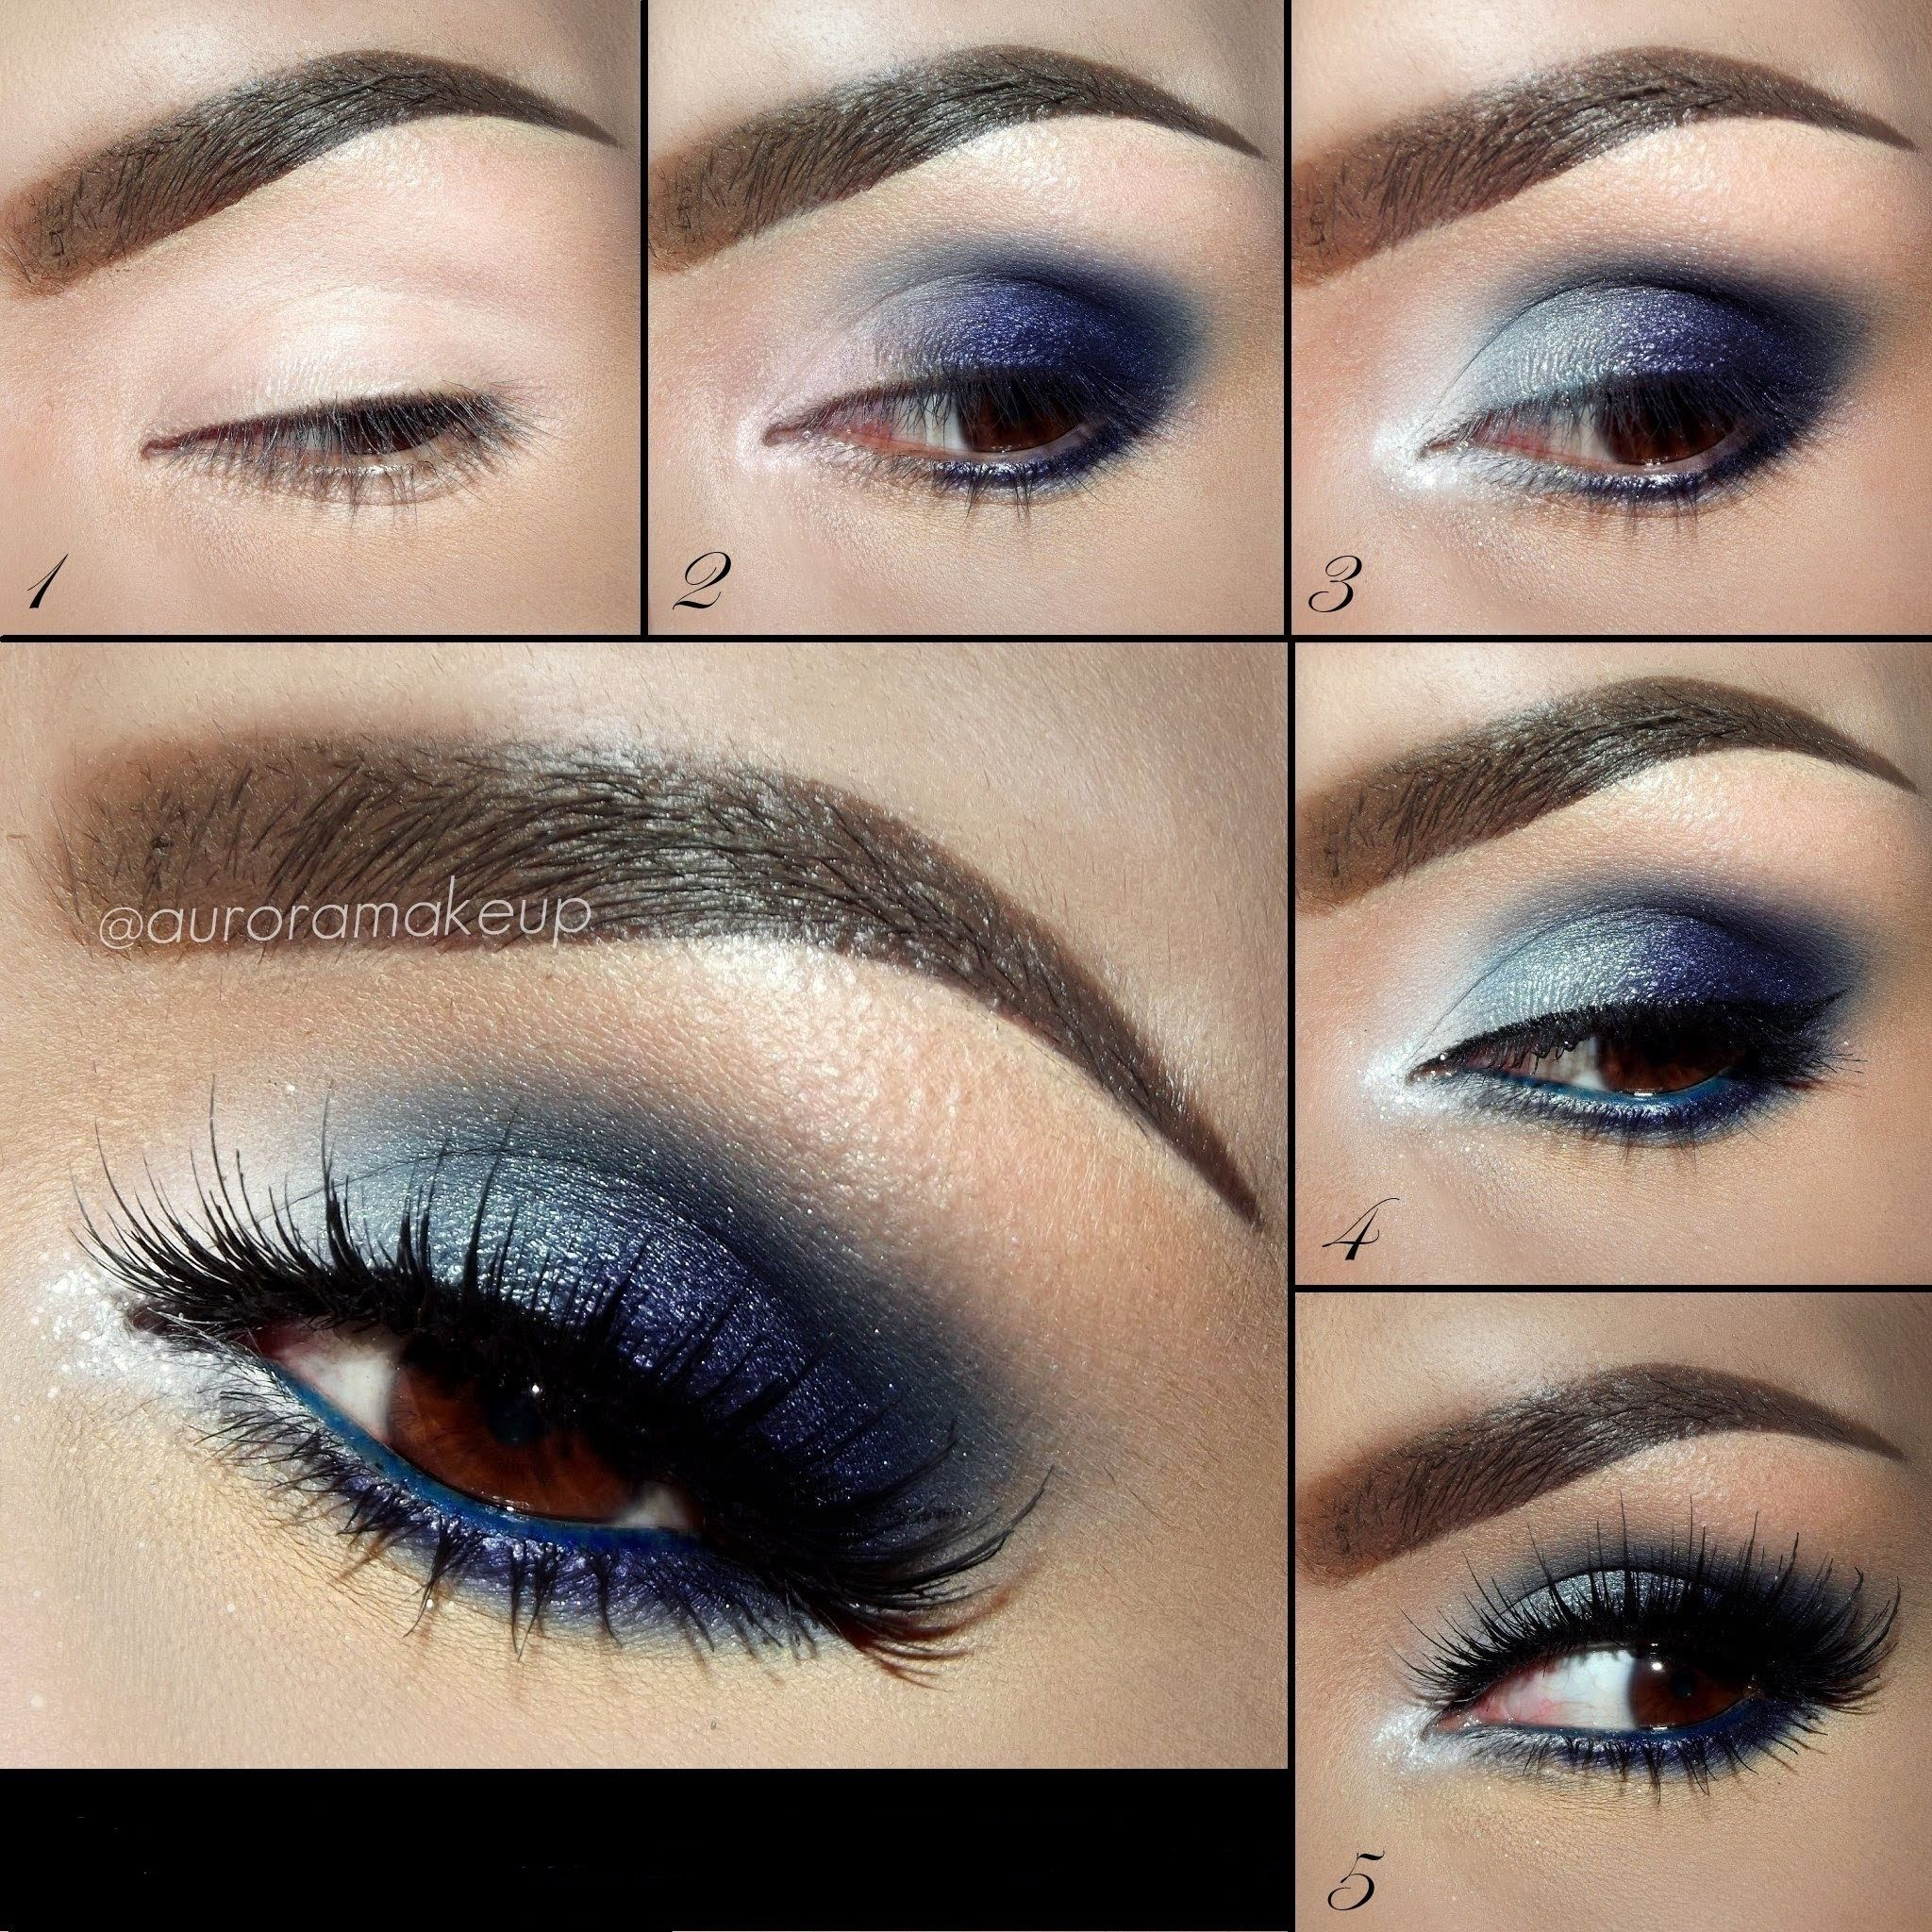 Eyeshadow for brown eyes blue smokey eye eye make up tutorials brown eye makeup tutorial baditri Image collections